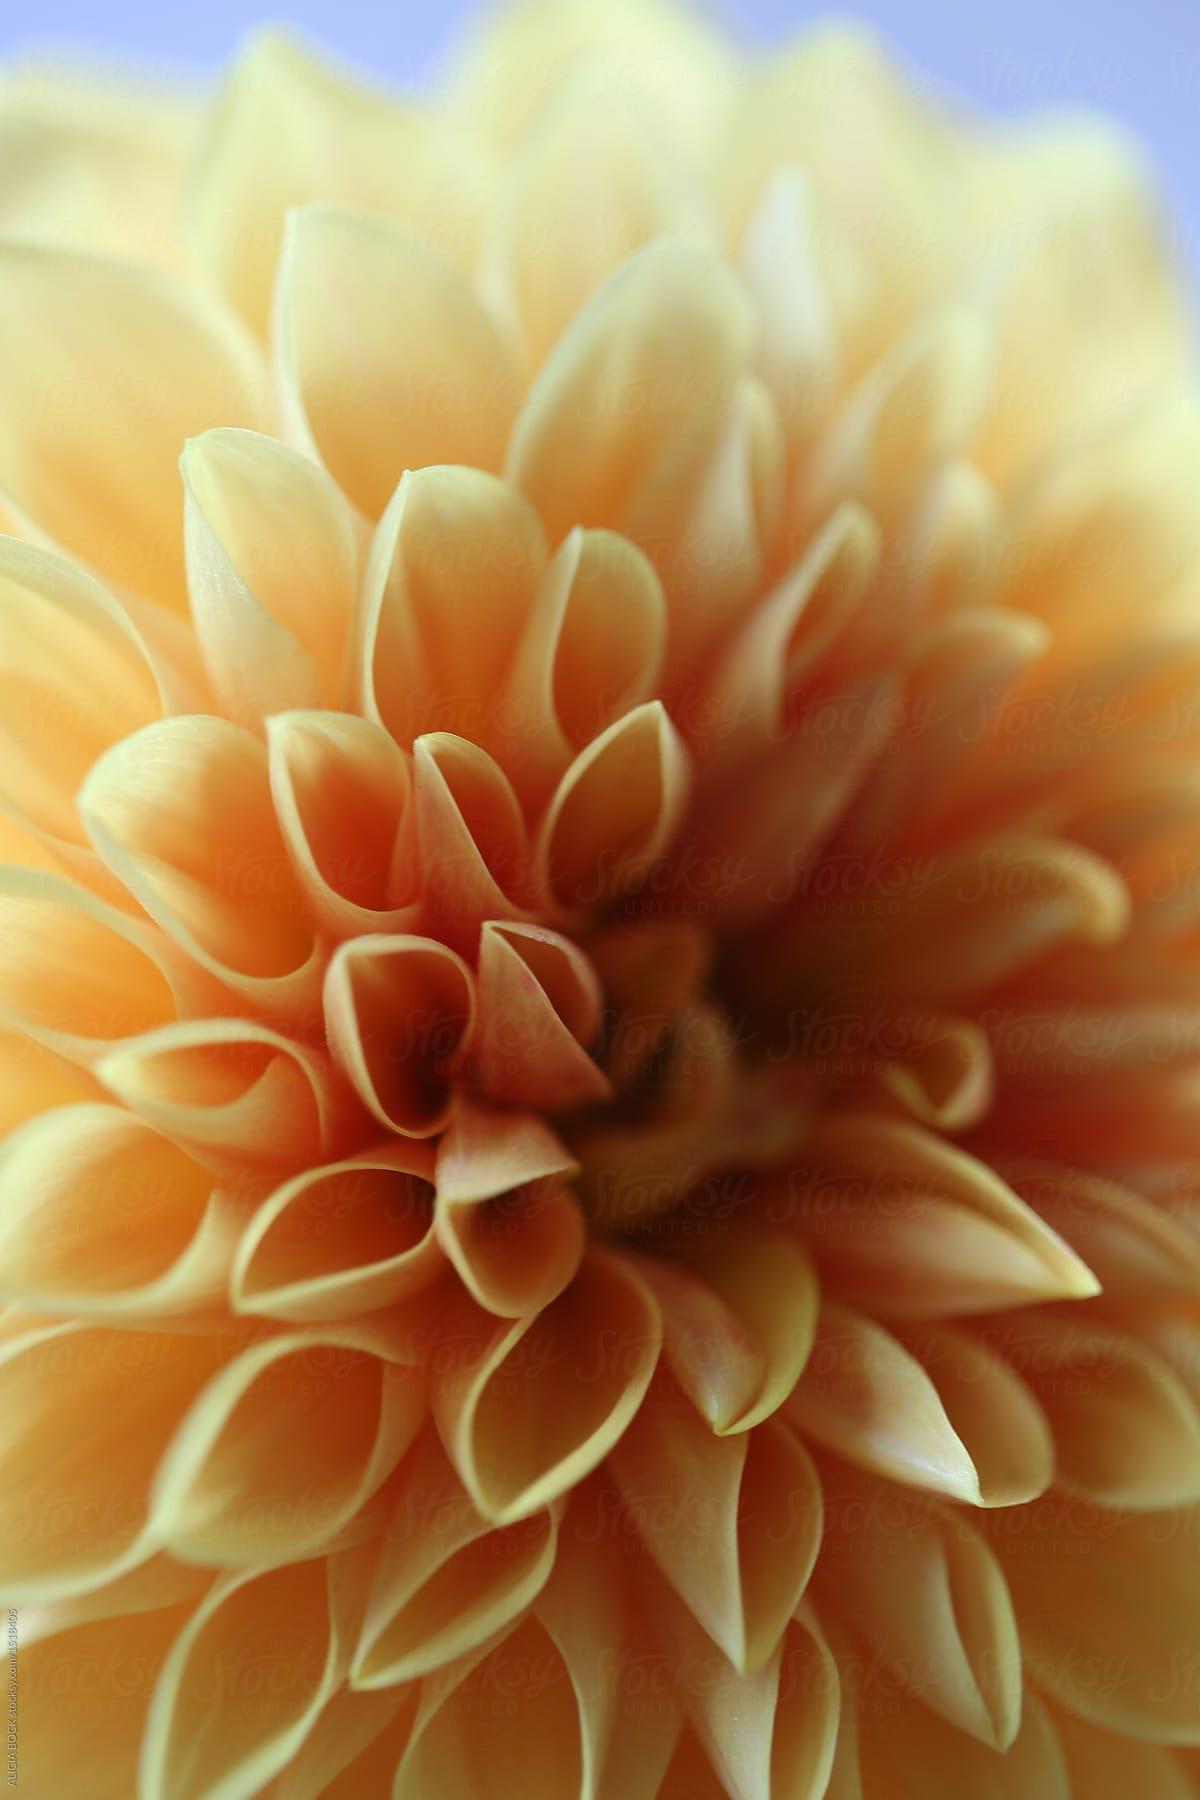 Close up of a pale orange dahlia flower stocksy united close up of a pale orange dahlia flower by alicia bock for stocksy united izmirmasajfo